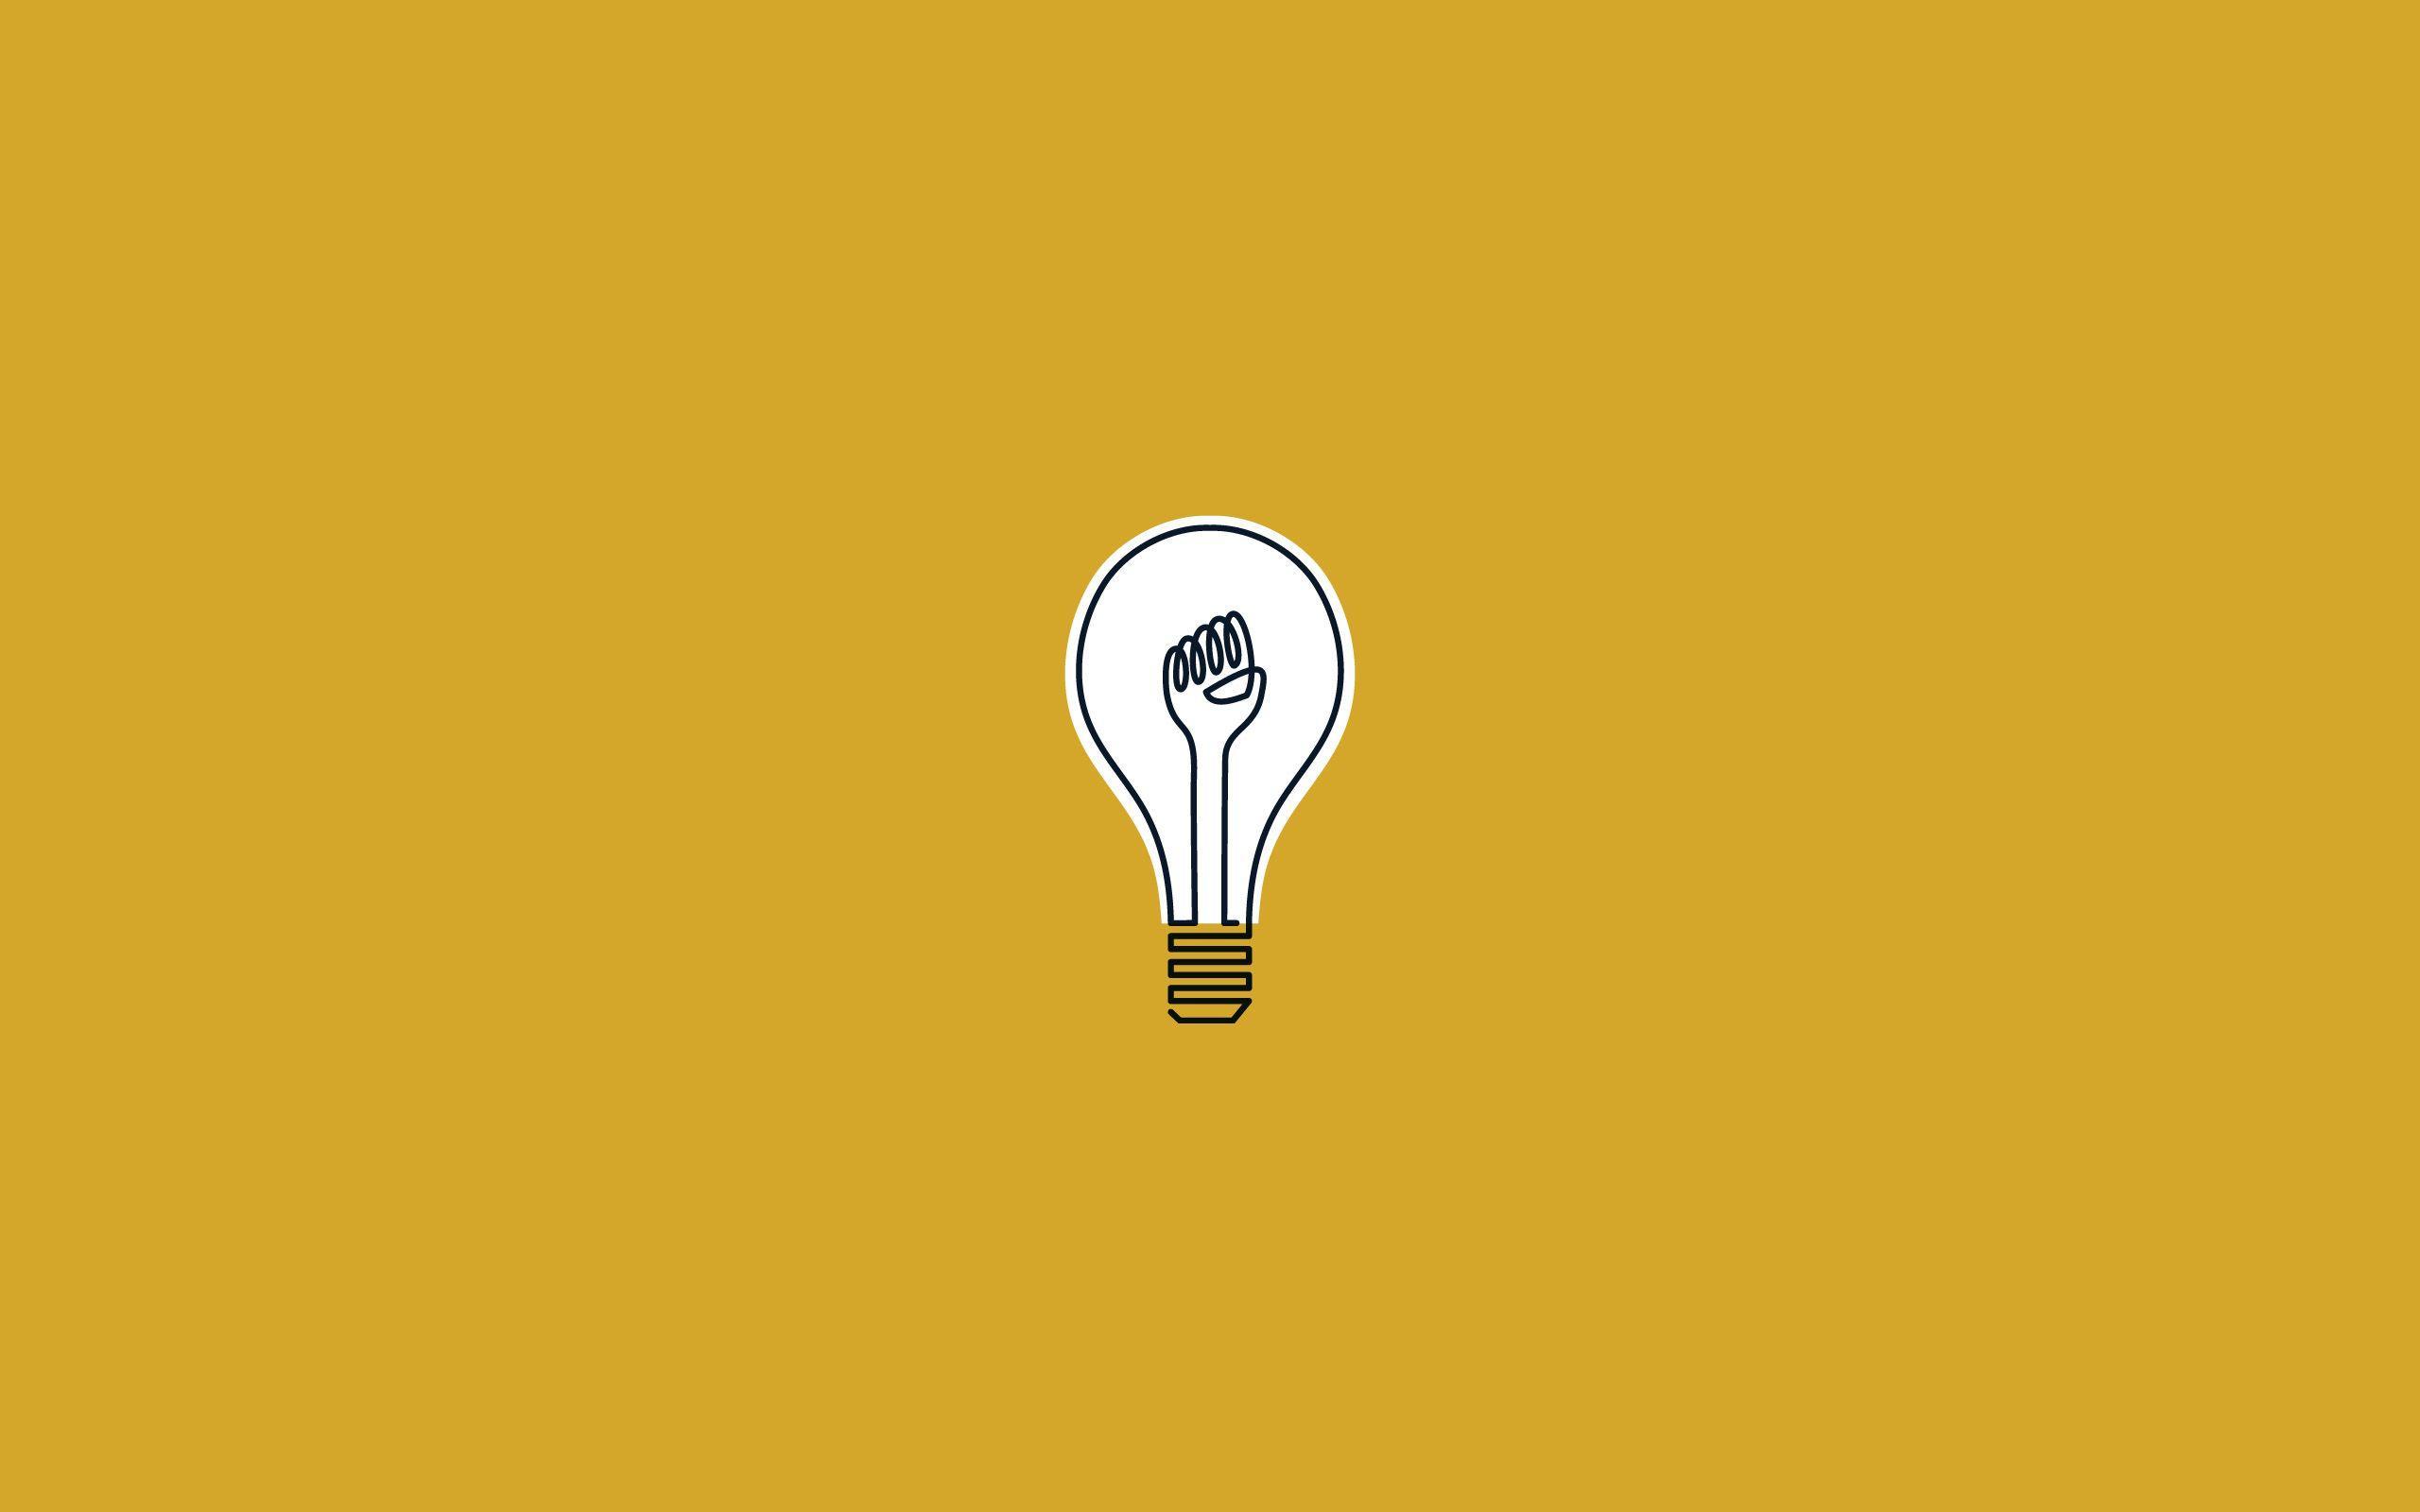 Yellow Aesthetic Mac Wallpapers - Top Free Yellow